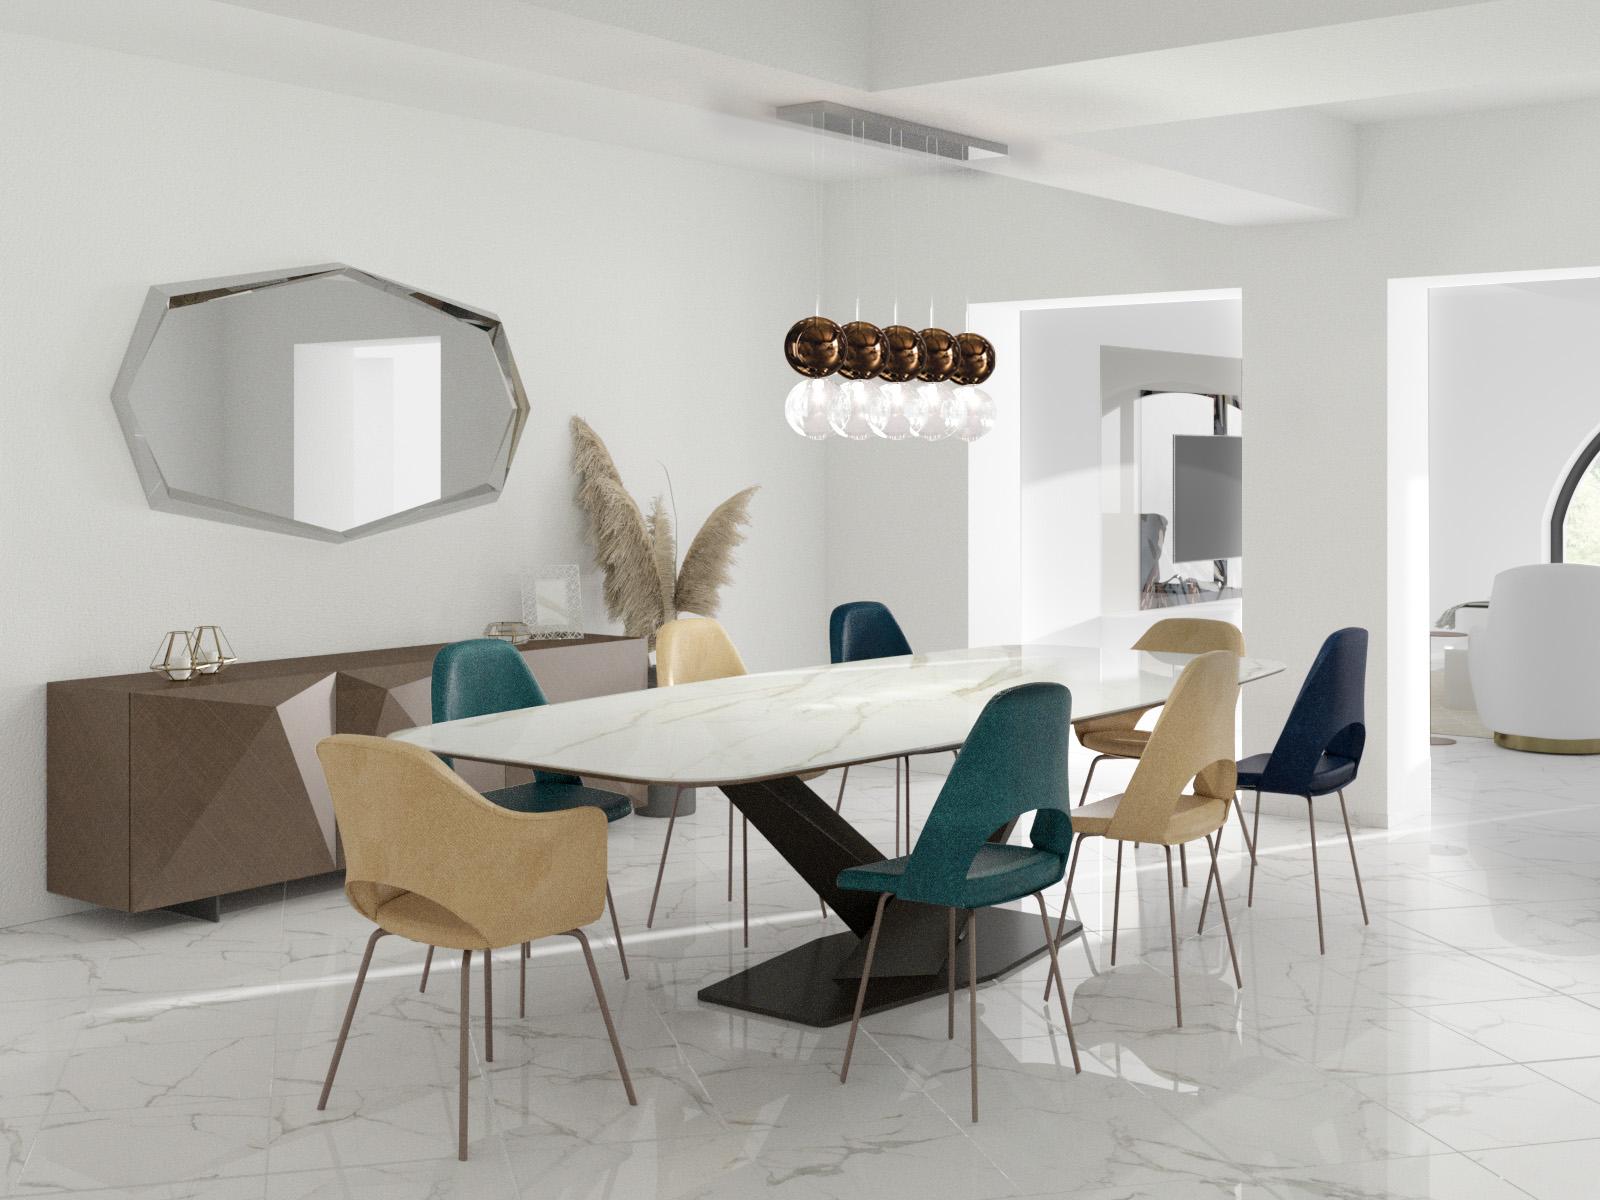 Sala da pranzo tutta bianca, con madie e sedie colorate